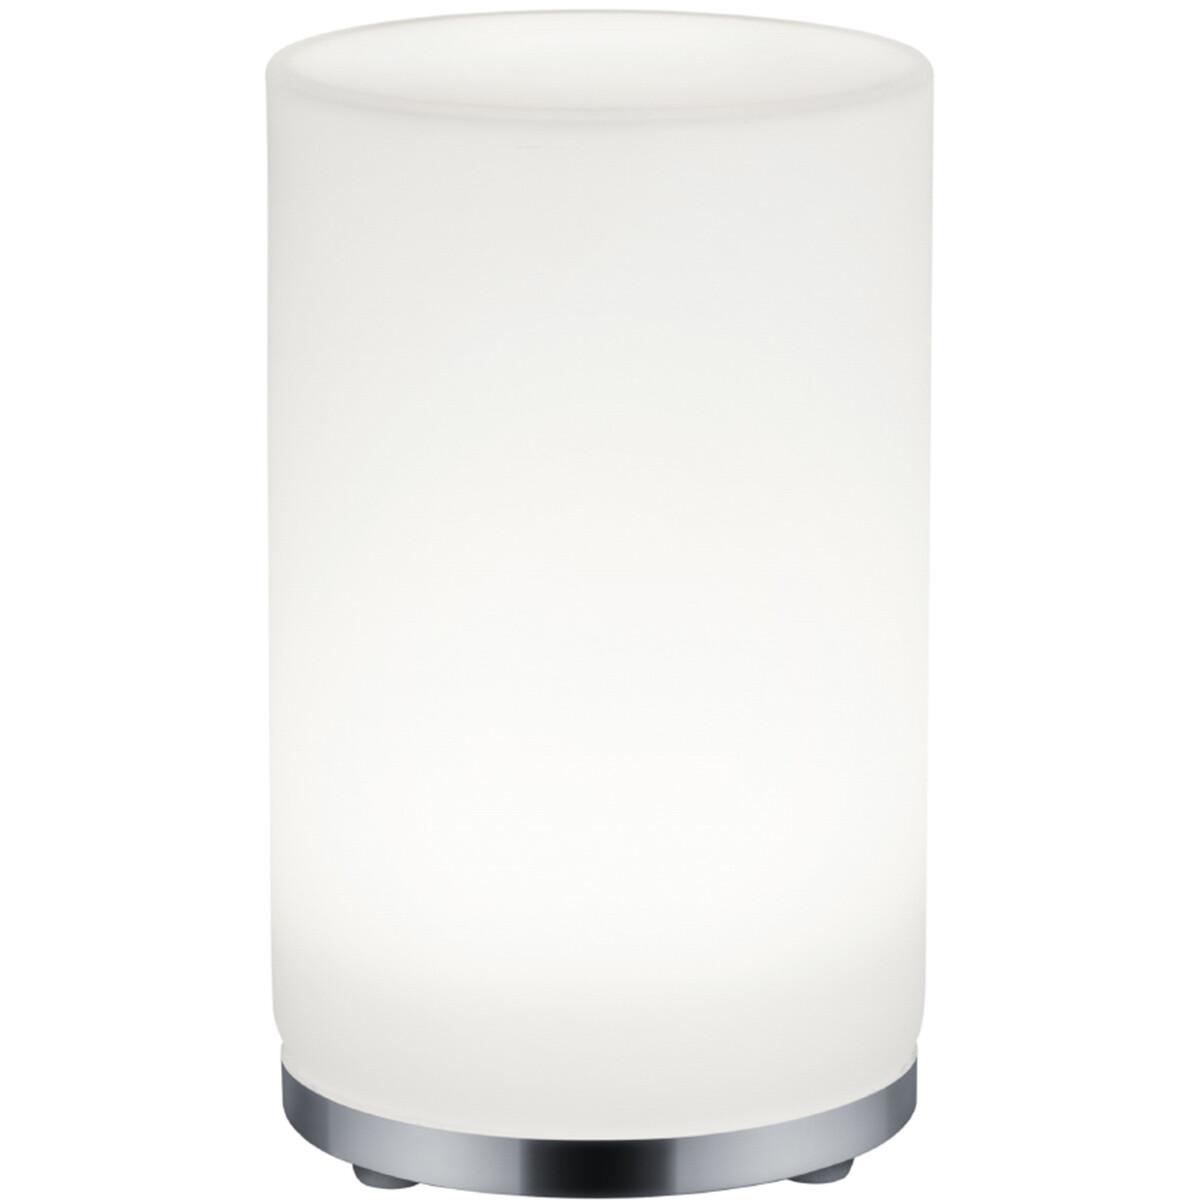 LED Tafellamp - Tafelverlichting - Trion Zakum - 5W - Warm Wit 3000K - Rond - Mat Chroom - Kunststof